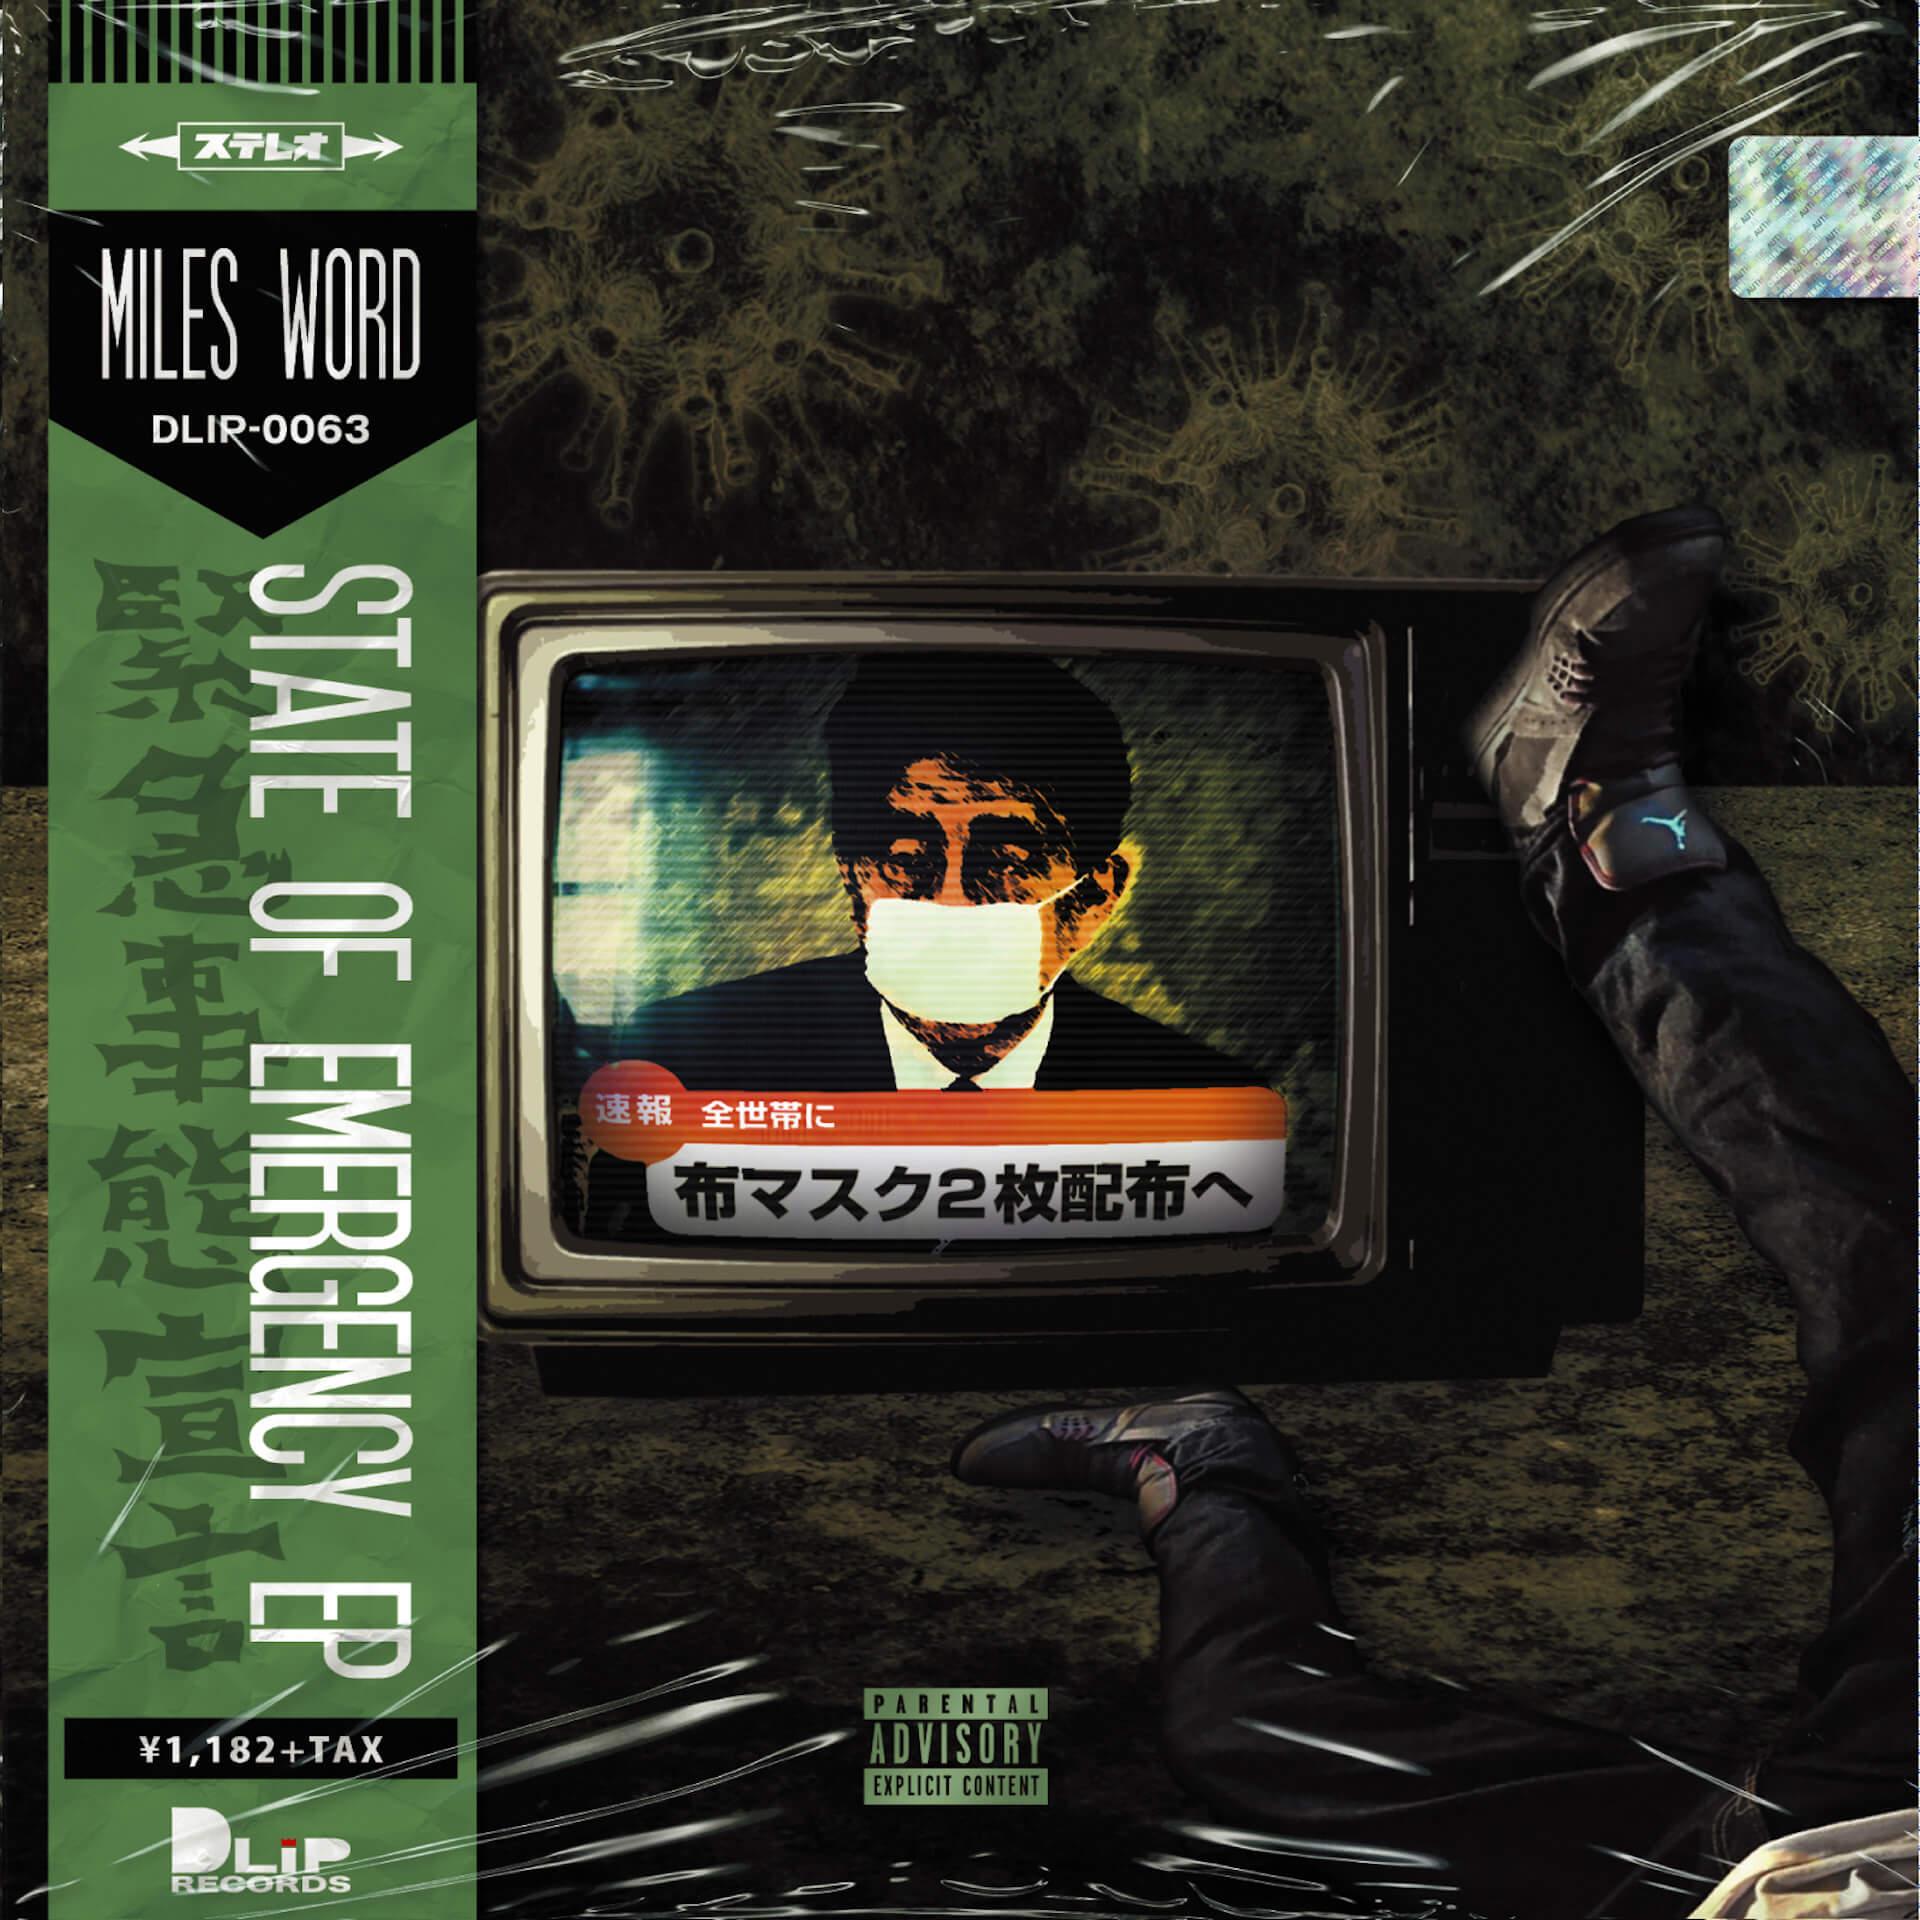 MILES WORDによる新EP『STATE OF EMERGENCY EP』がCDリリース&配信開始|〈DLiP RECORDS〉のムービーシリーズ『D#』でHOTTSな映像も公開 music200731_milesword_1